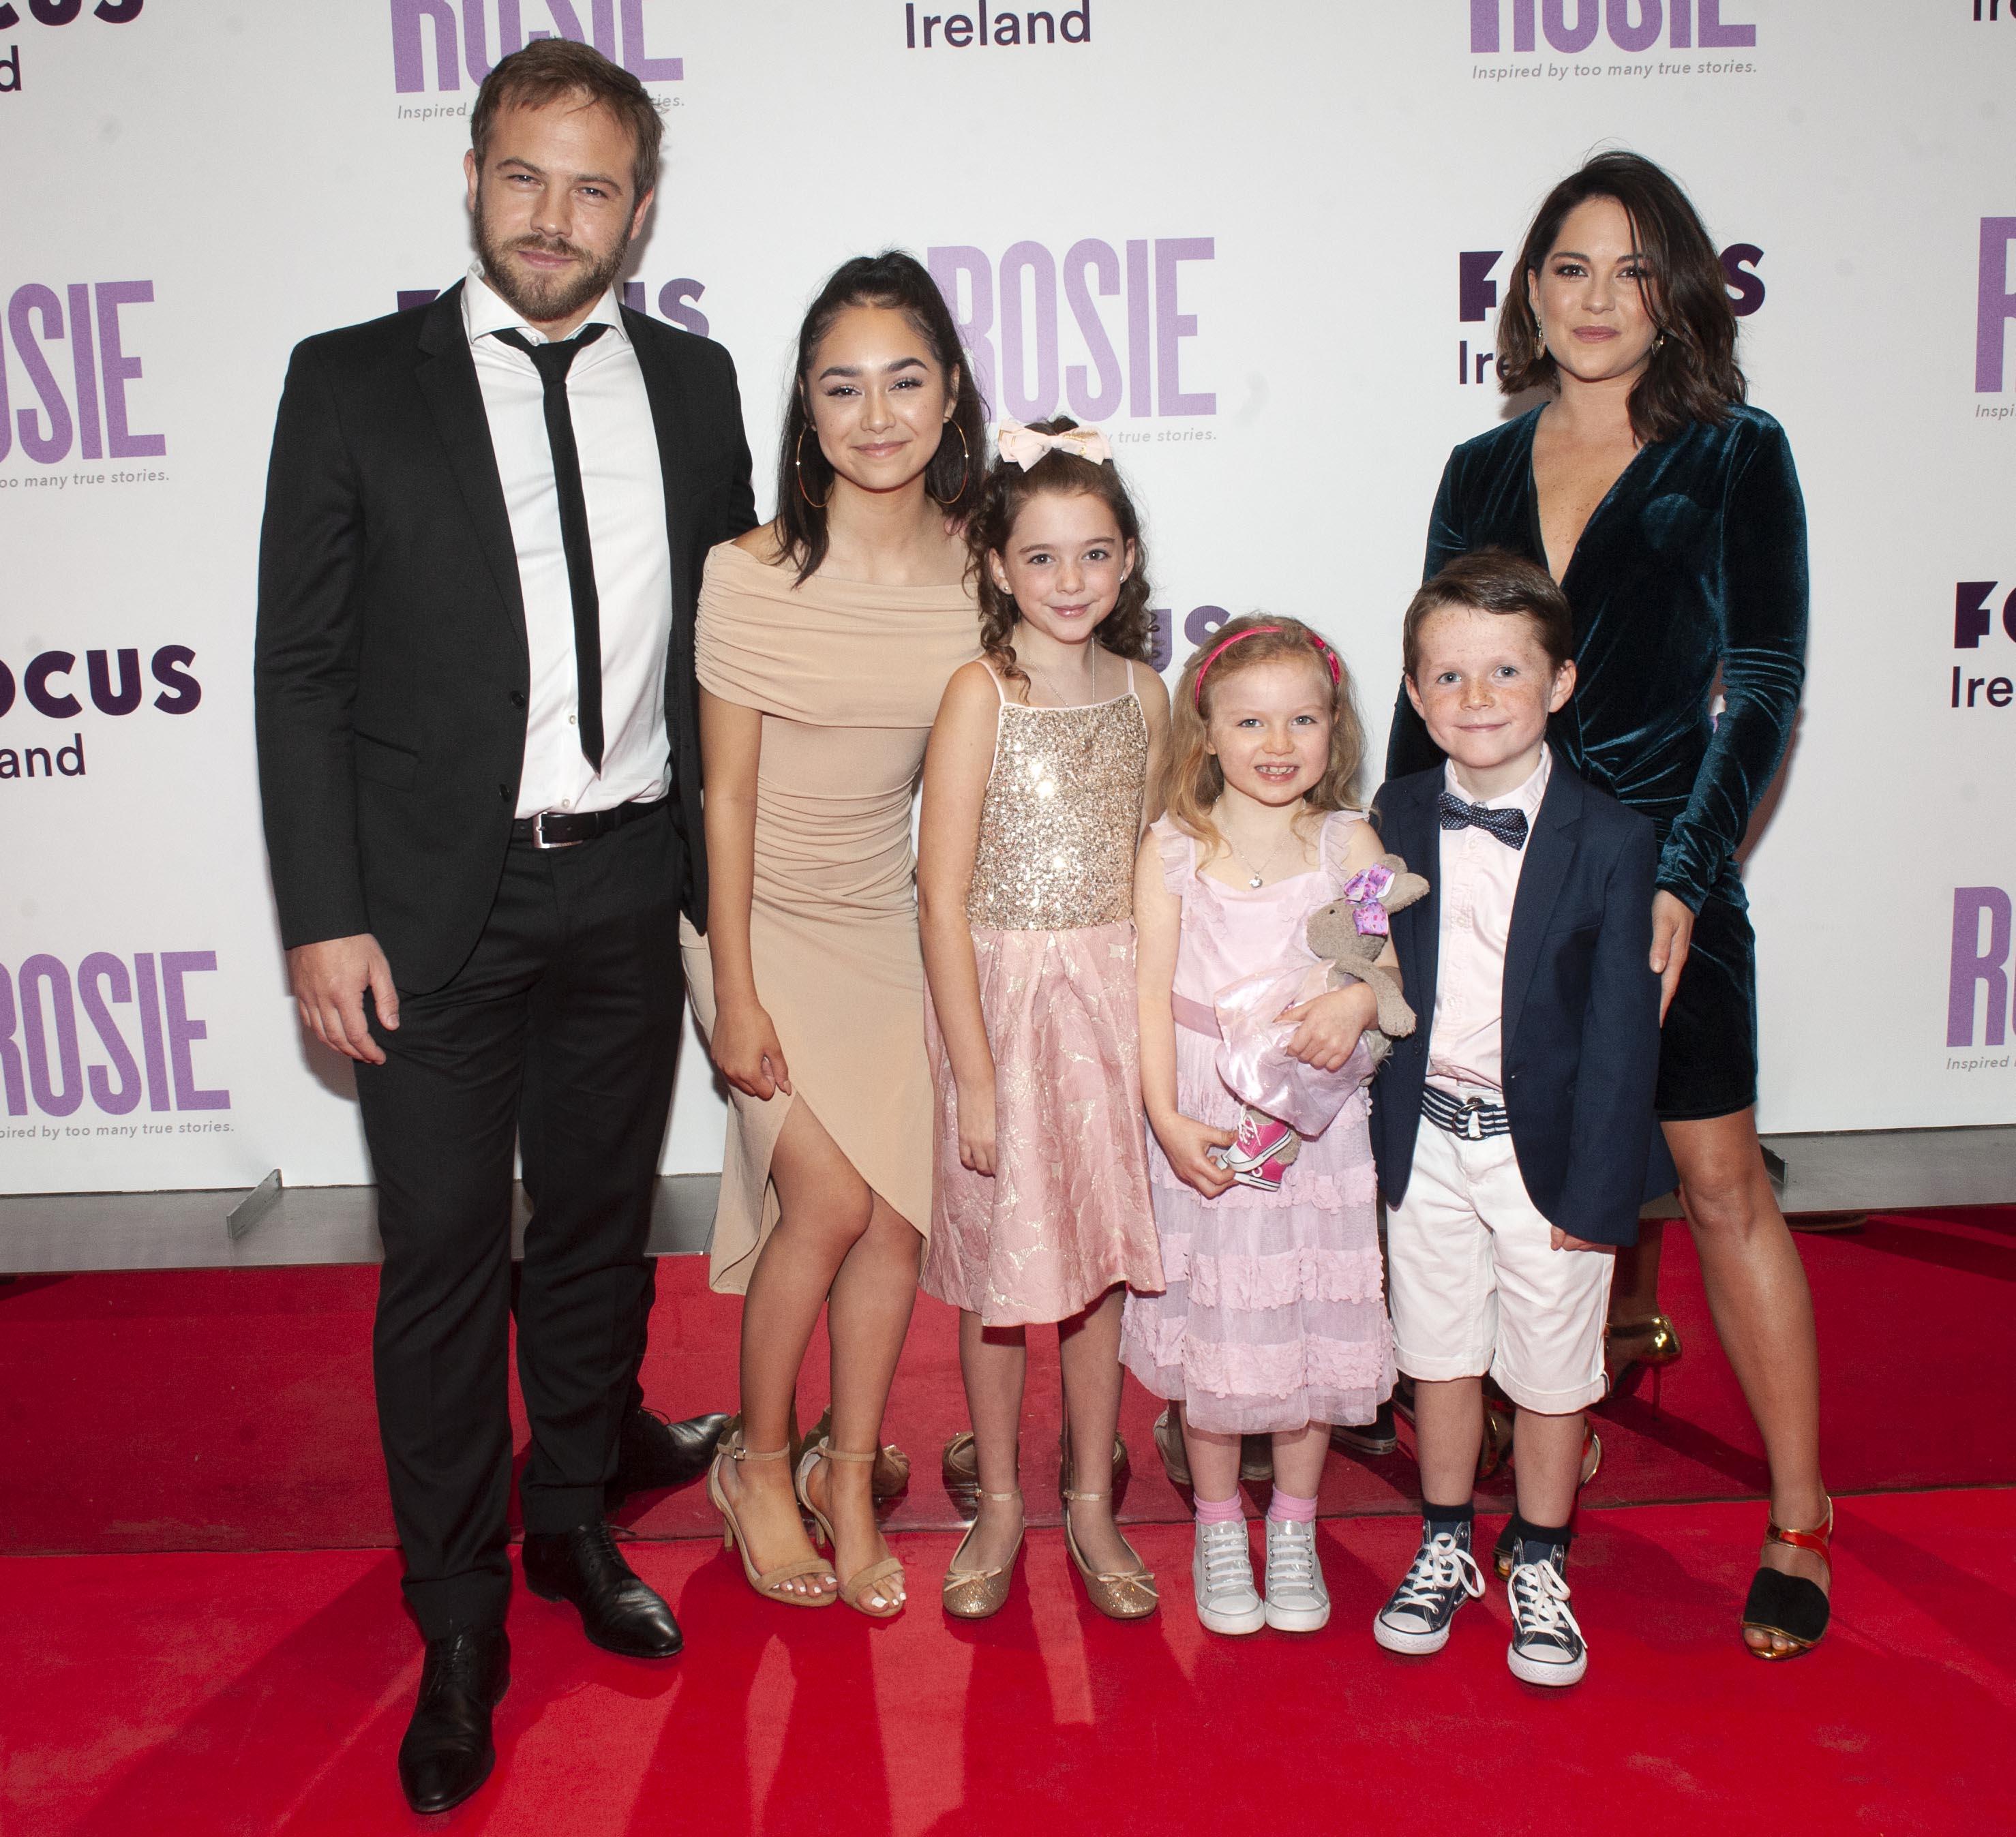 Molly McCann & cast of Rosie - Premiere